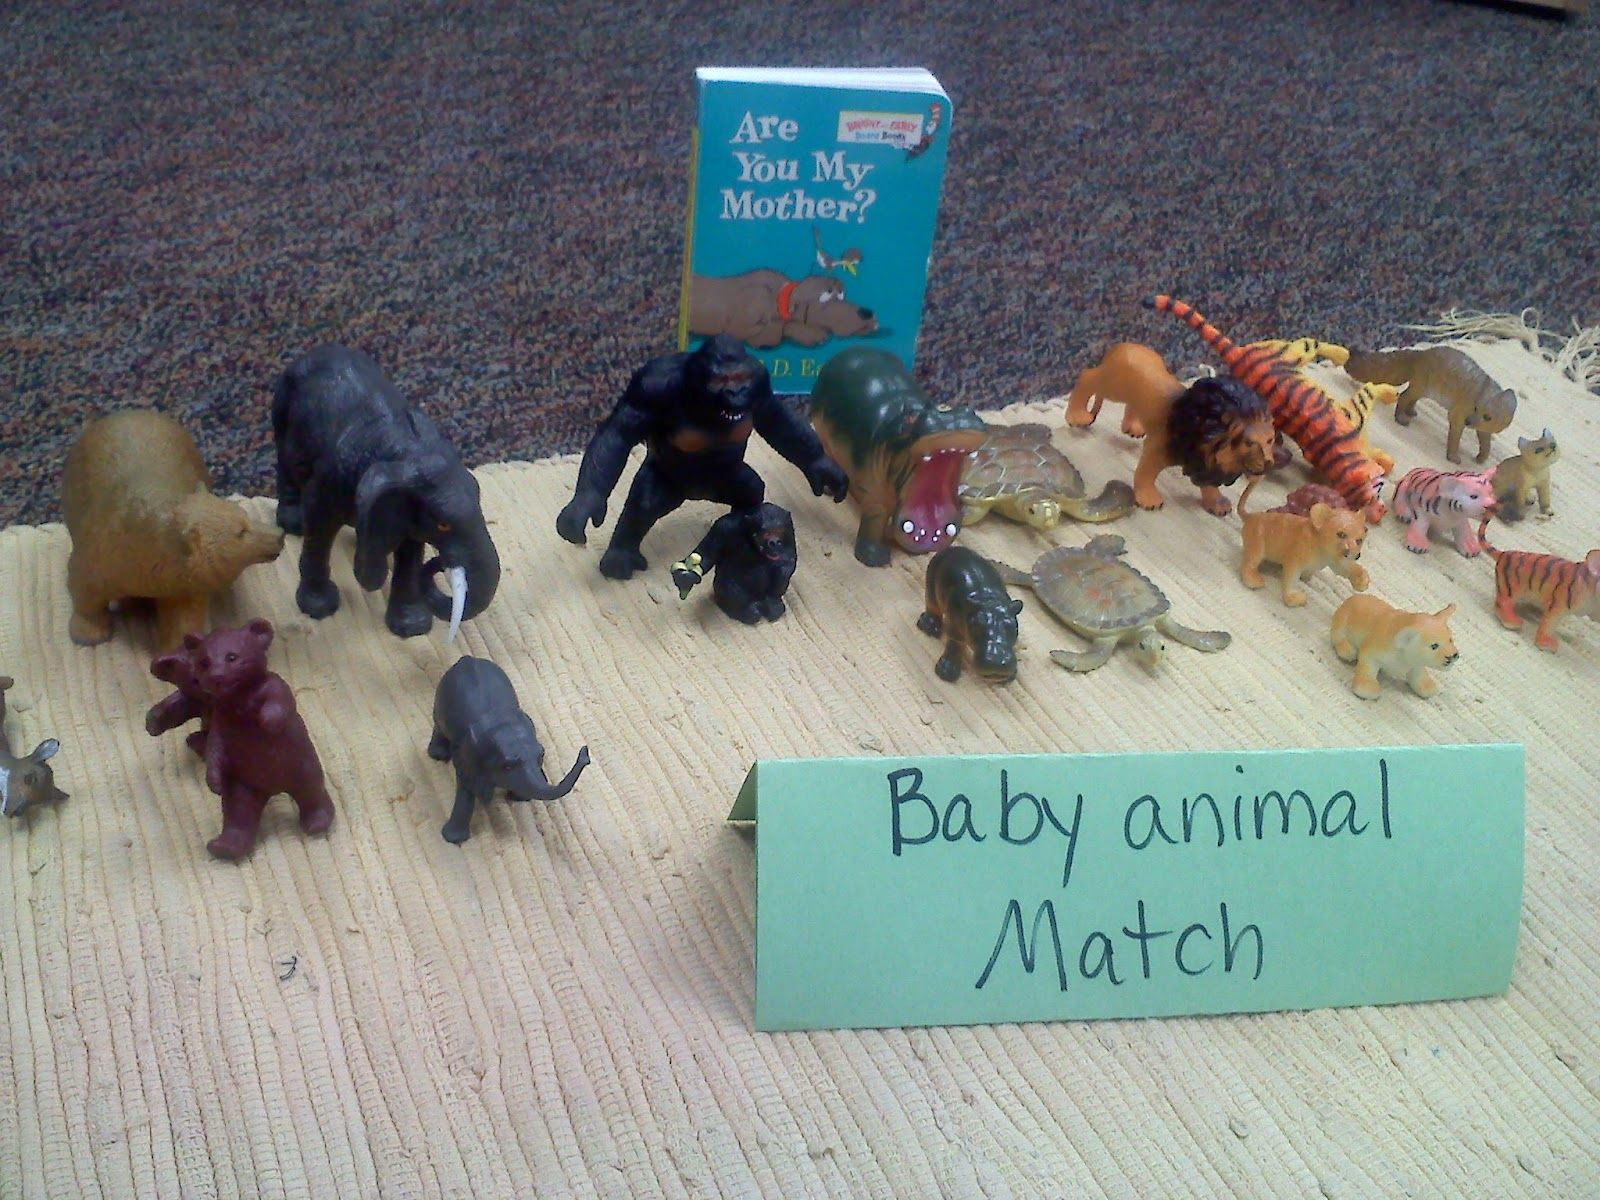 Coyne S Crazy Fun Preschool Classroom Create Your Own Baby Animal Matching Game